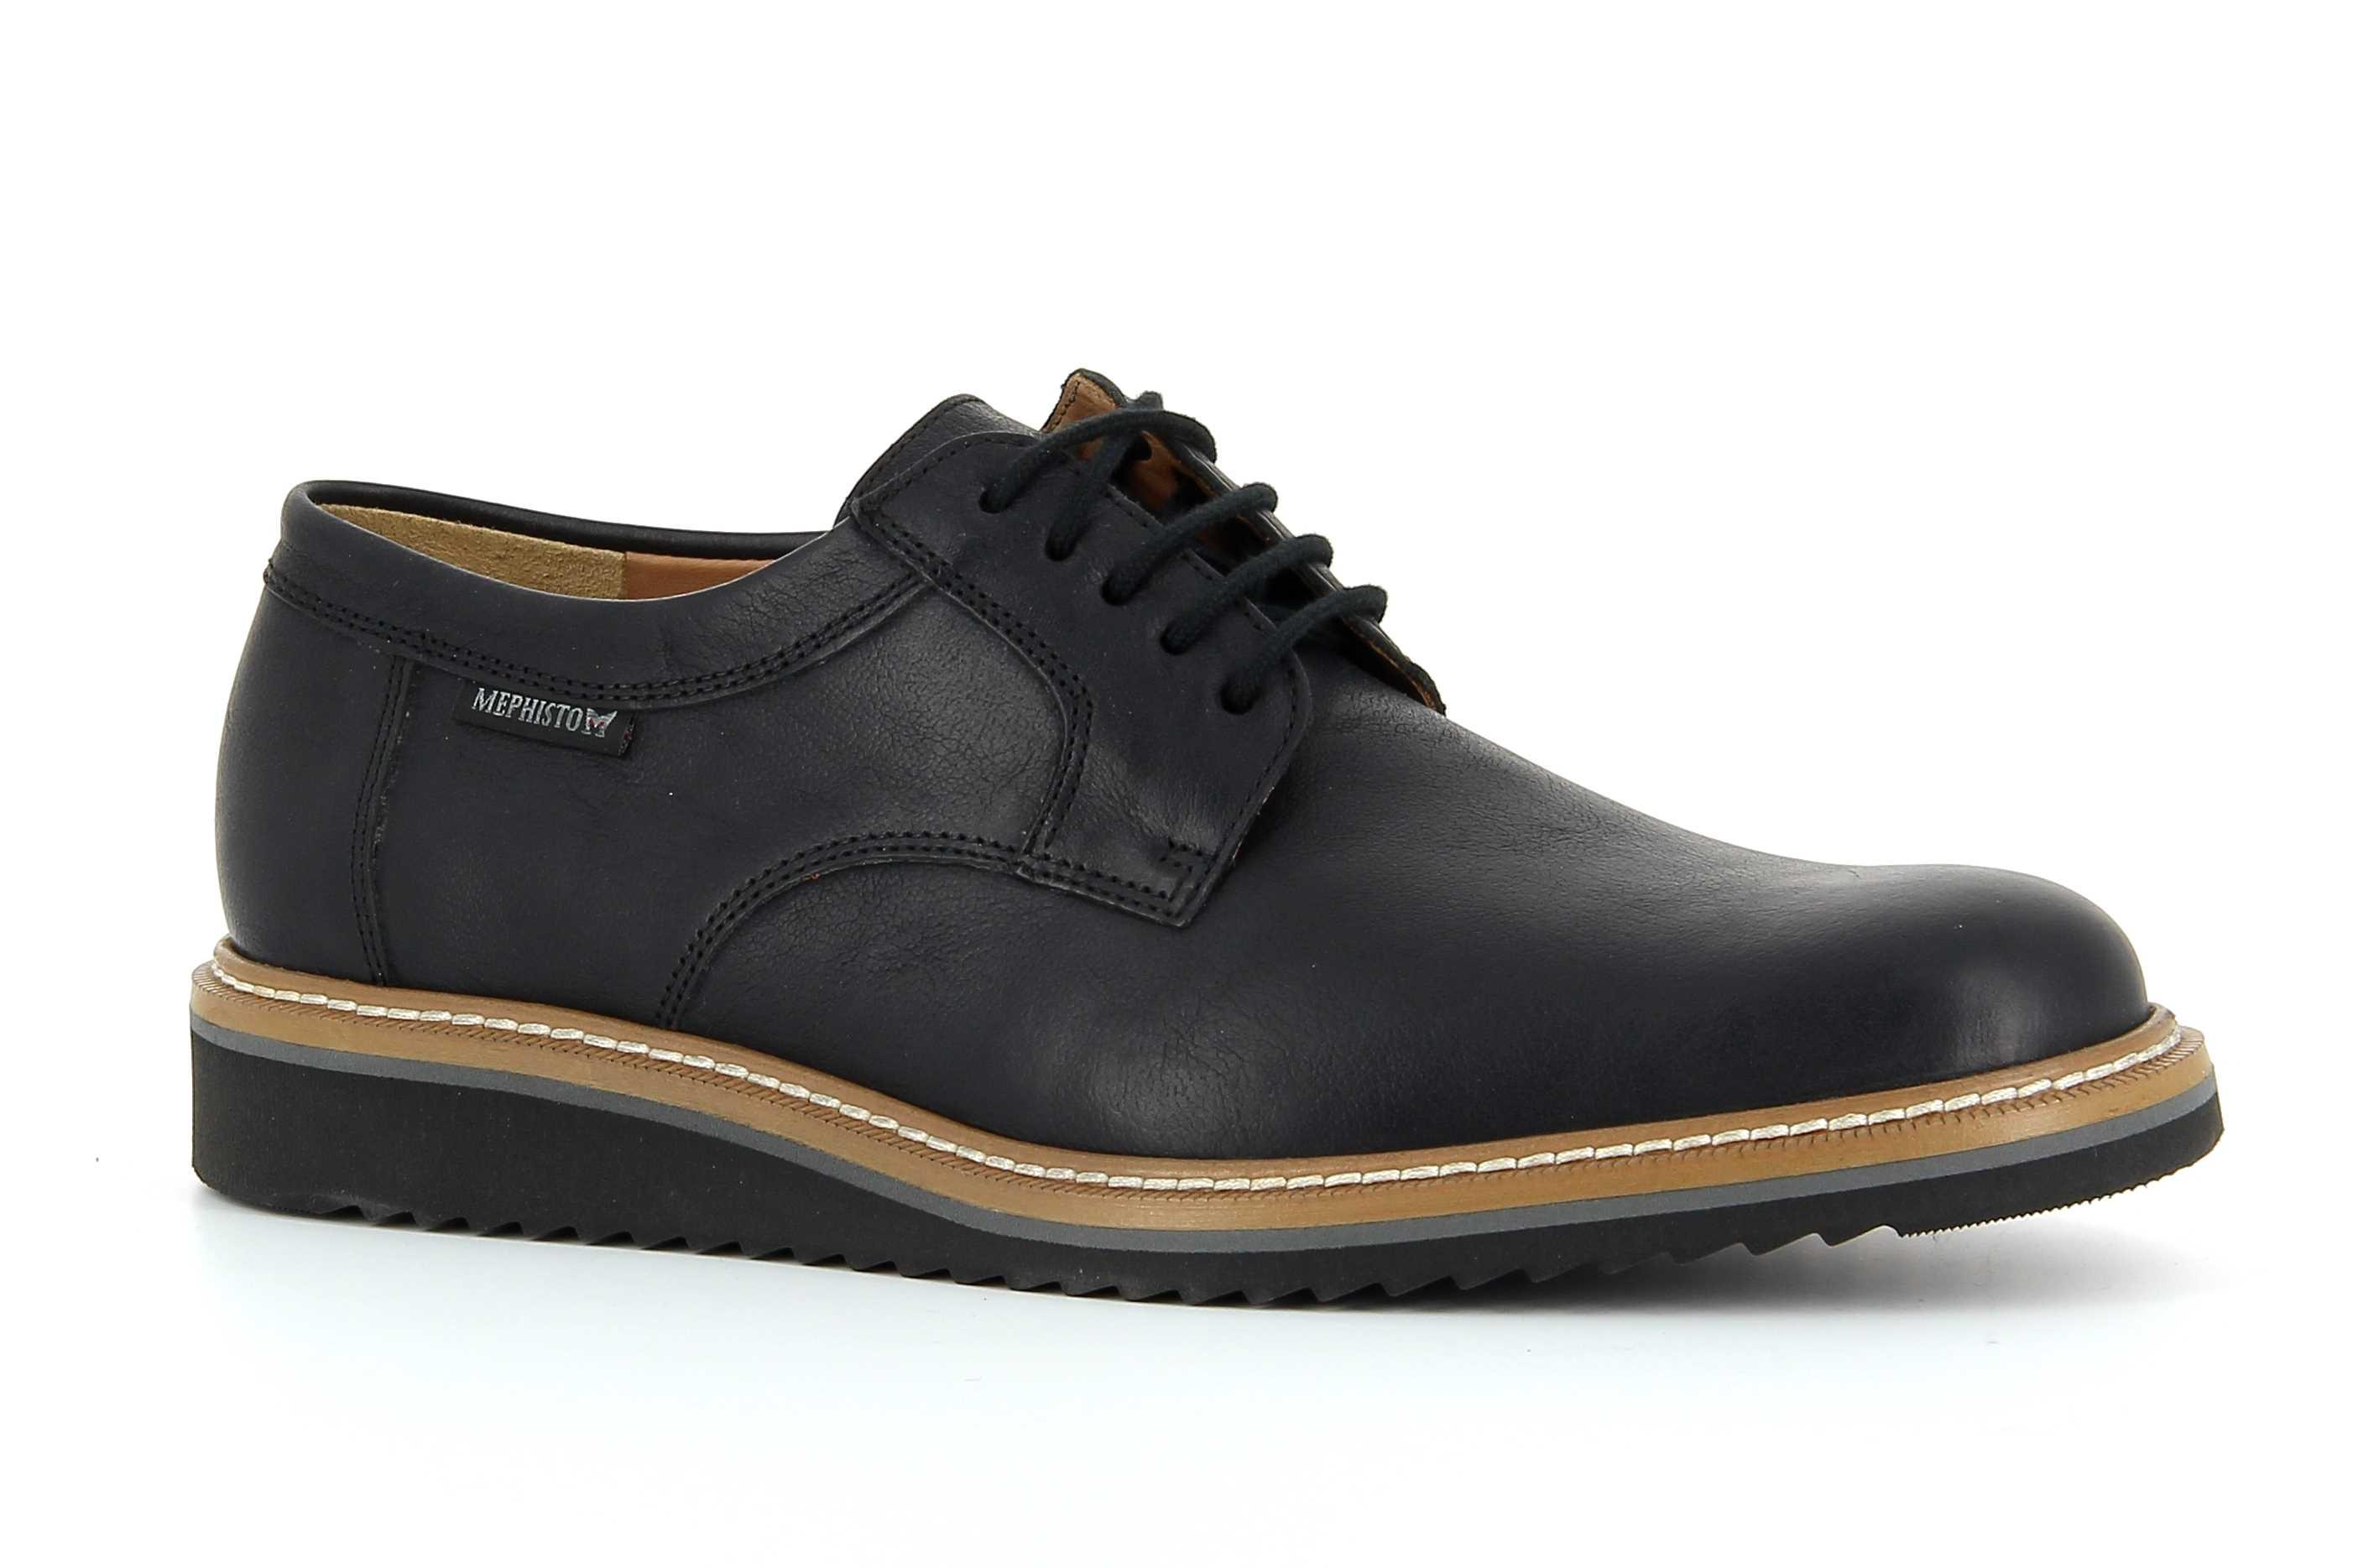 mephisto shop chaussures confortables lacets homme mod le enzo. Black Bedroom Furniture Sets. Home Design Ideas